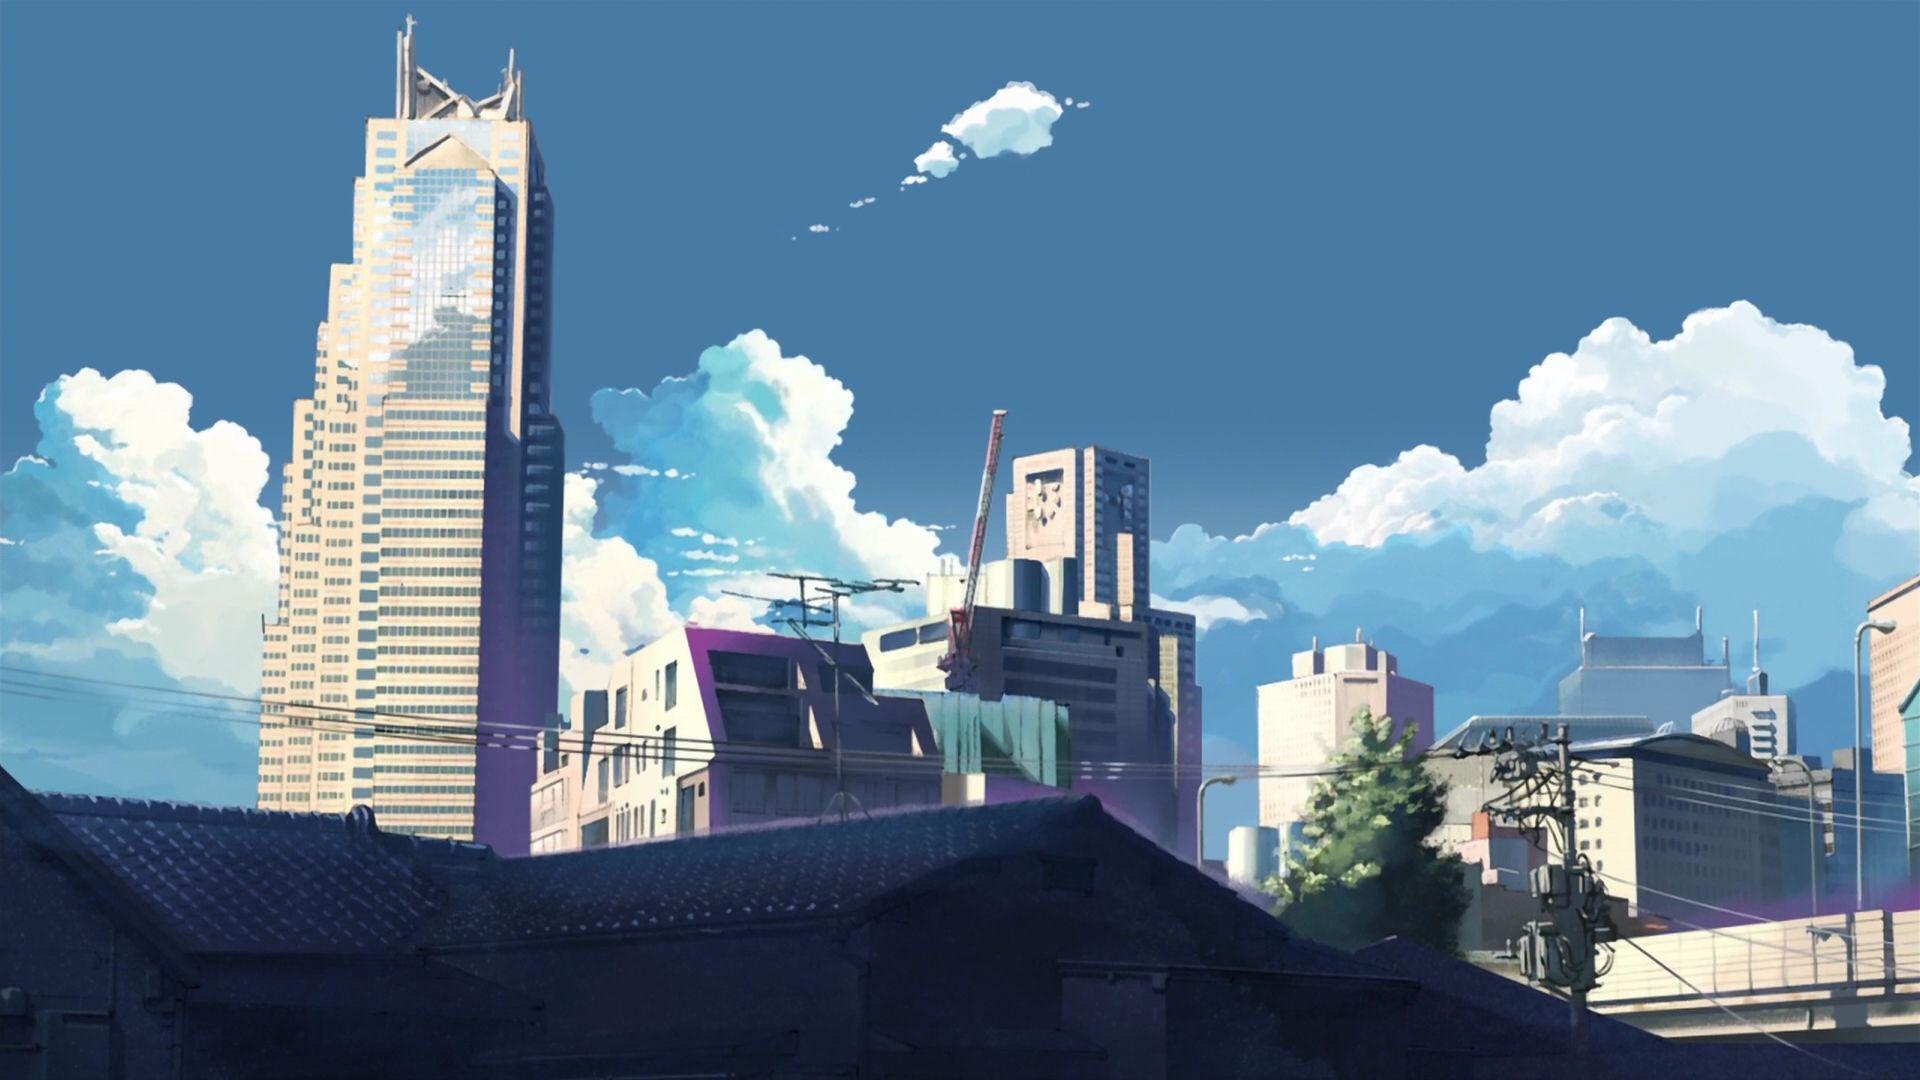 Aesthetic Anime Desktop Wallpapers Top Free Aesthetic